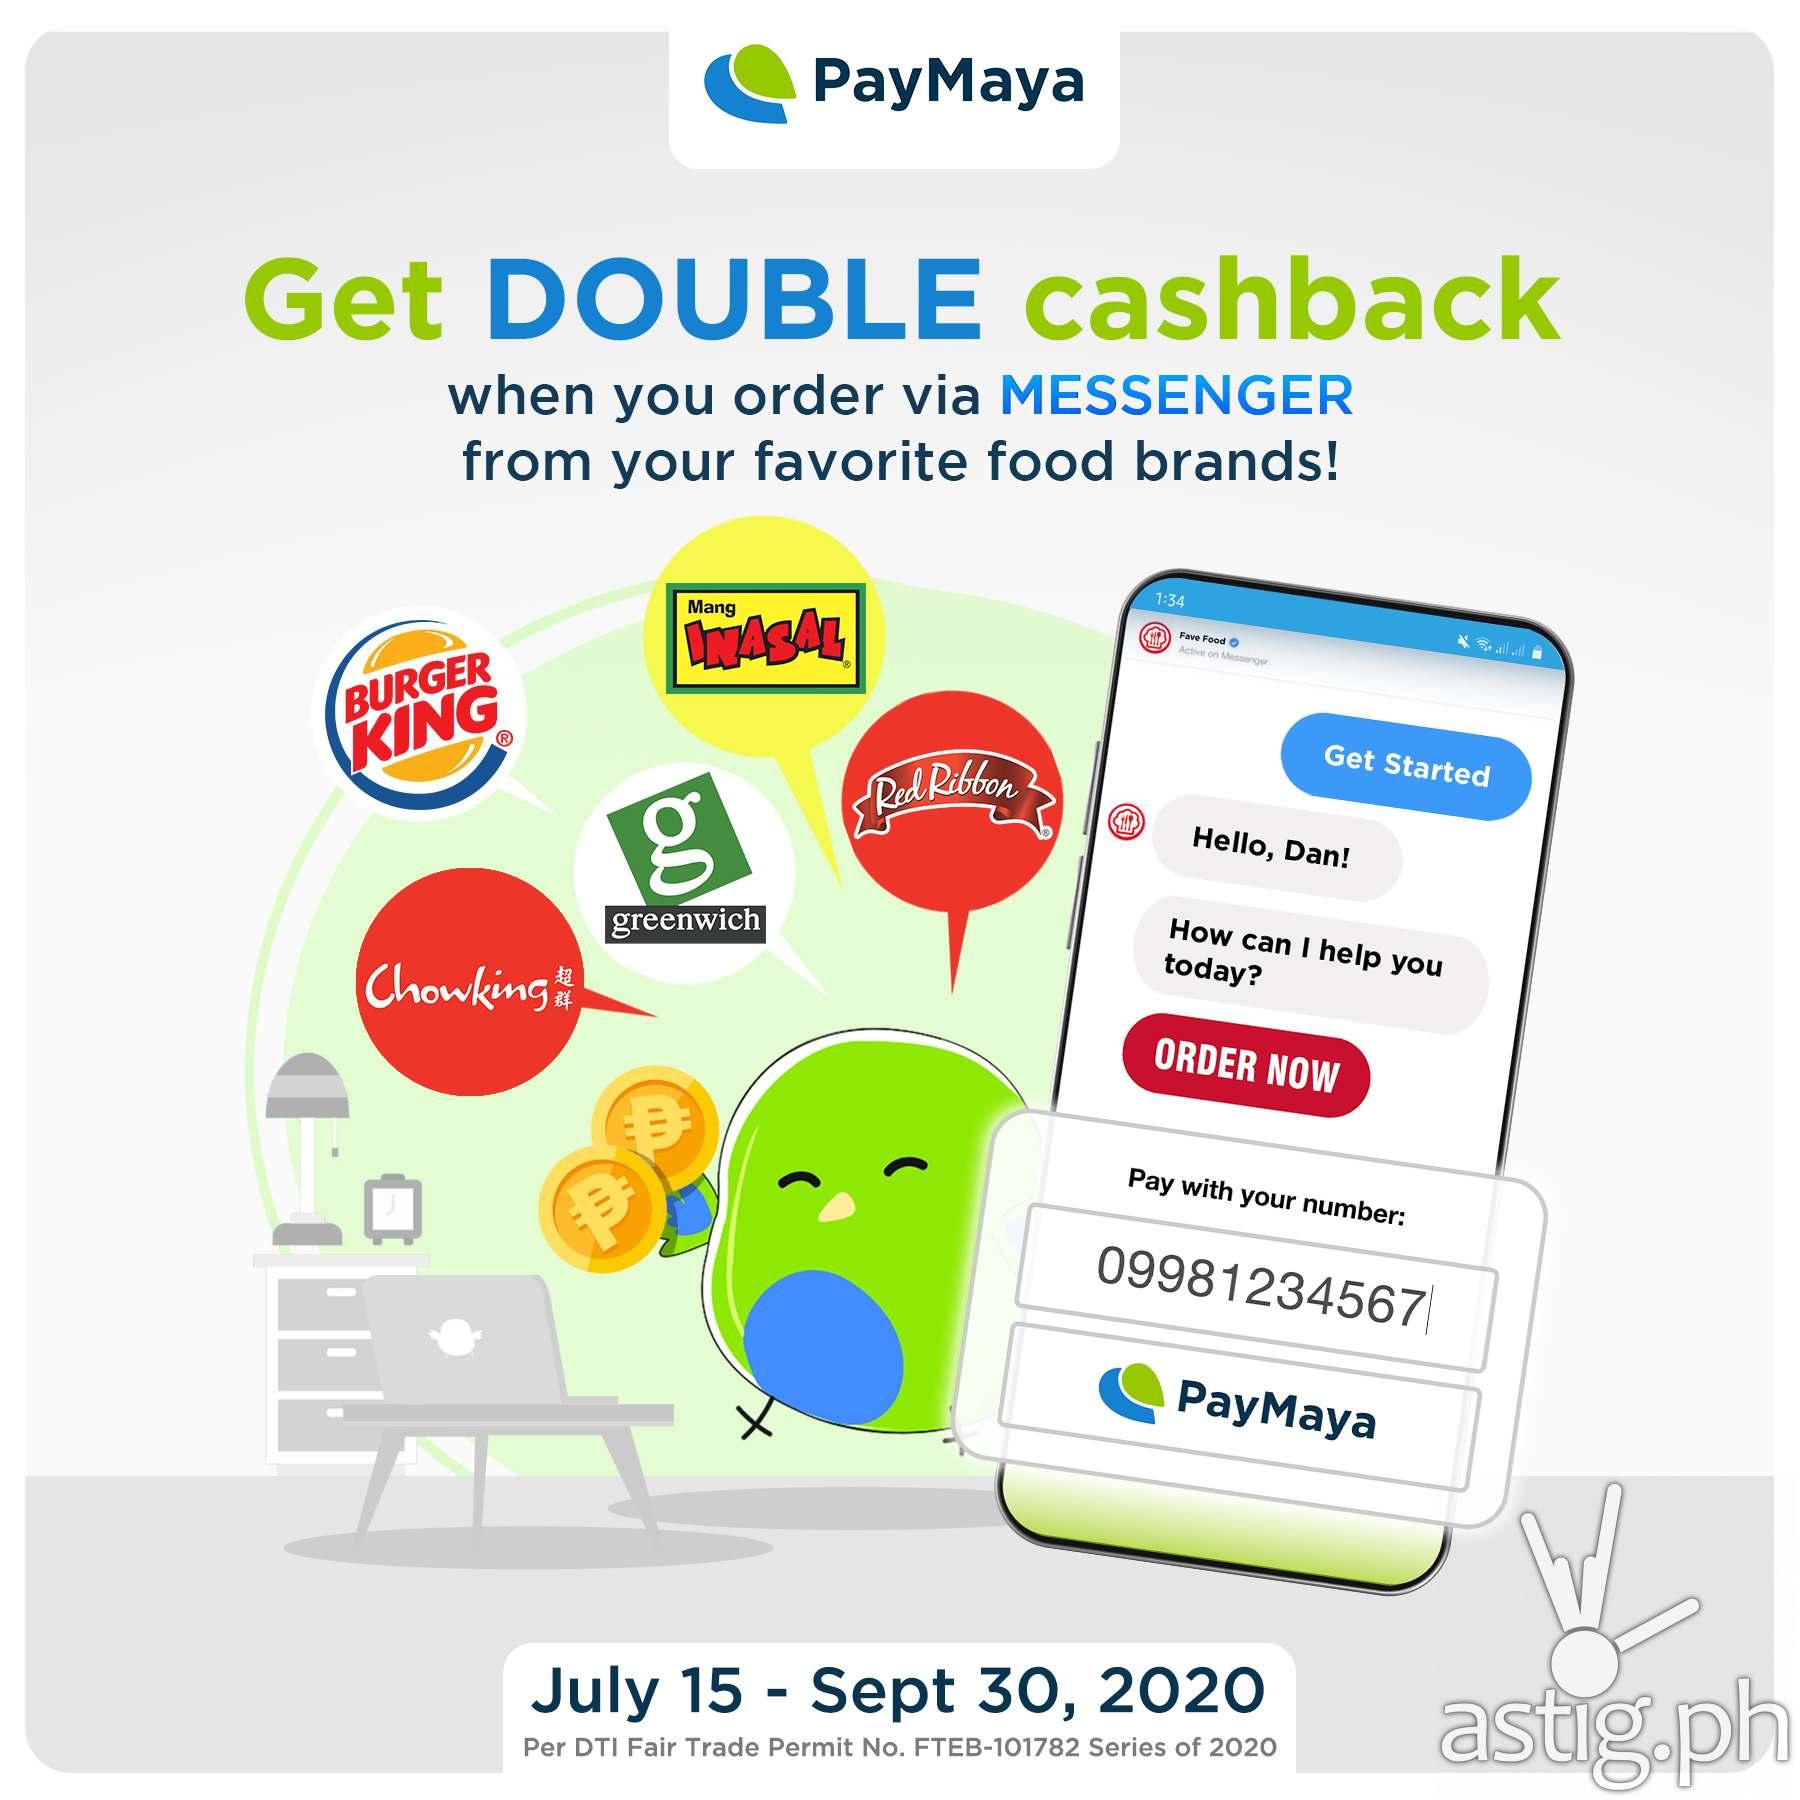 Jollibee PayMaya double cash back promo 2020